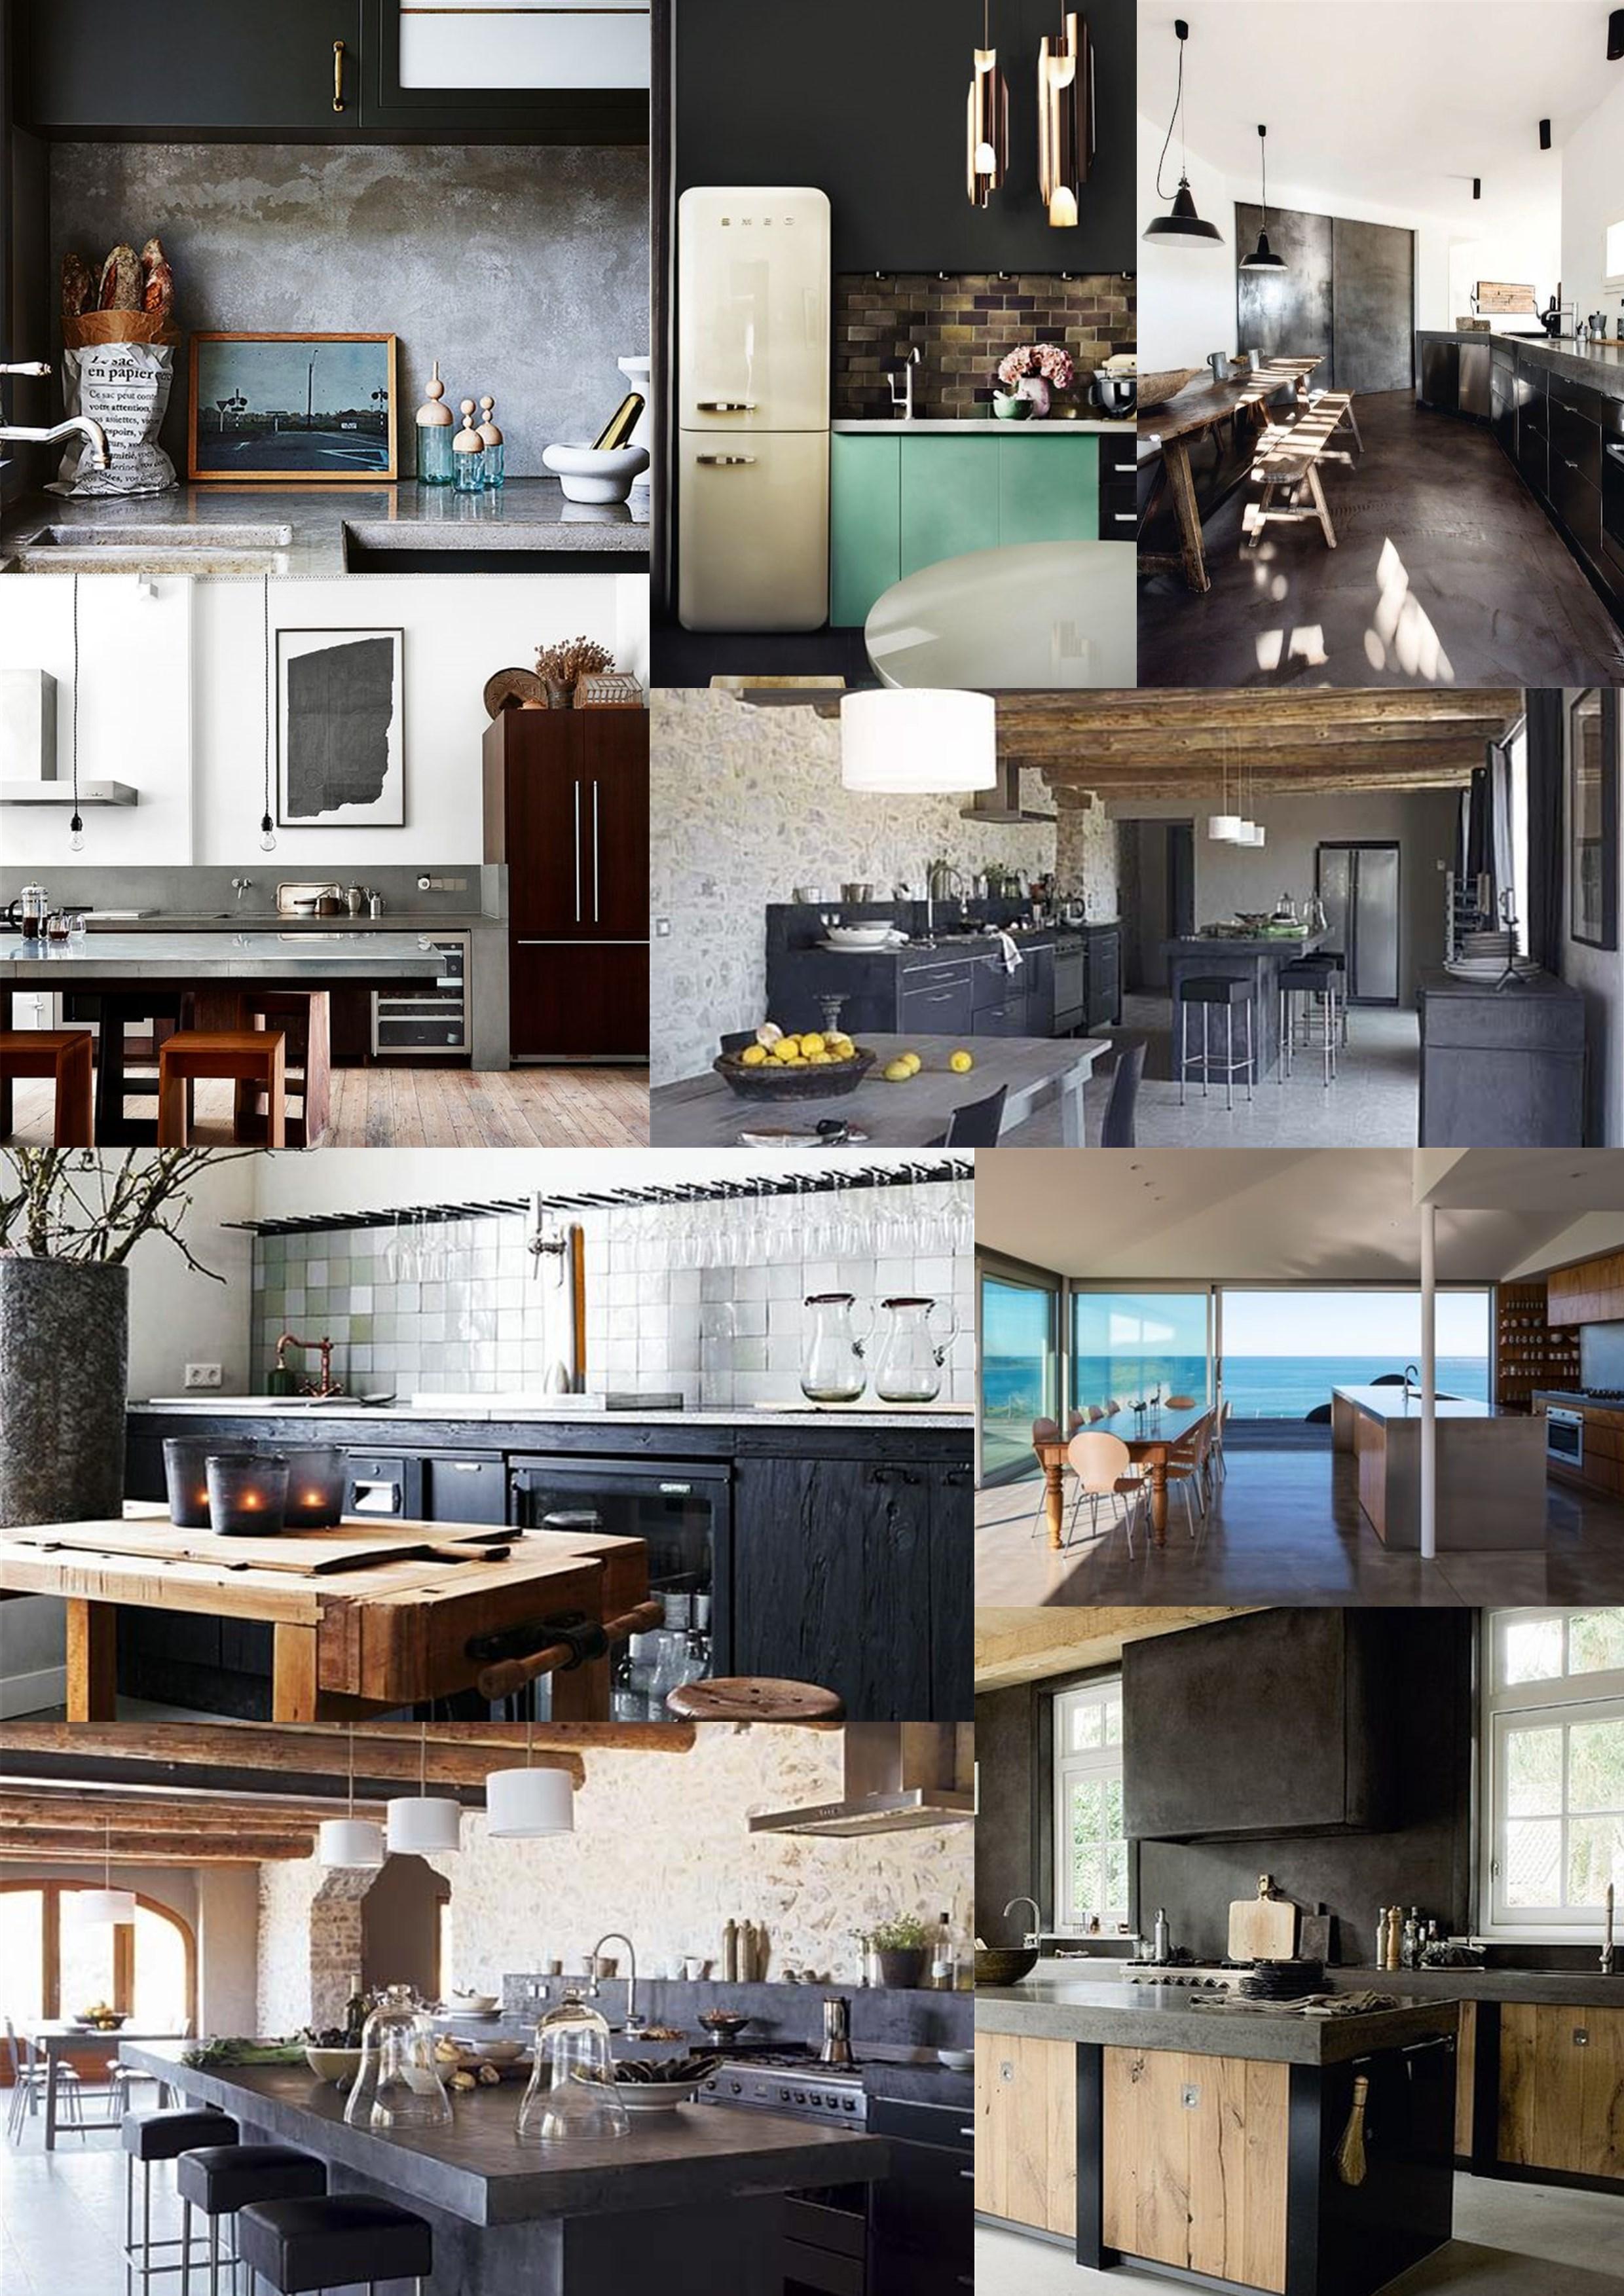 Diy house build my kitchen mood board threadbare cloak - Make a house a home ...